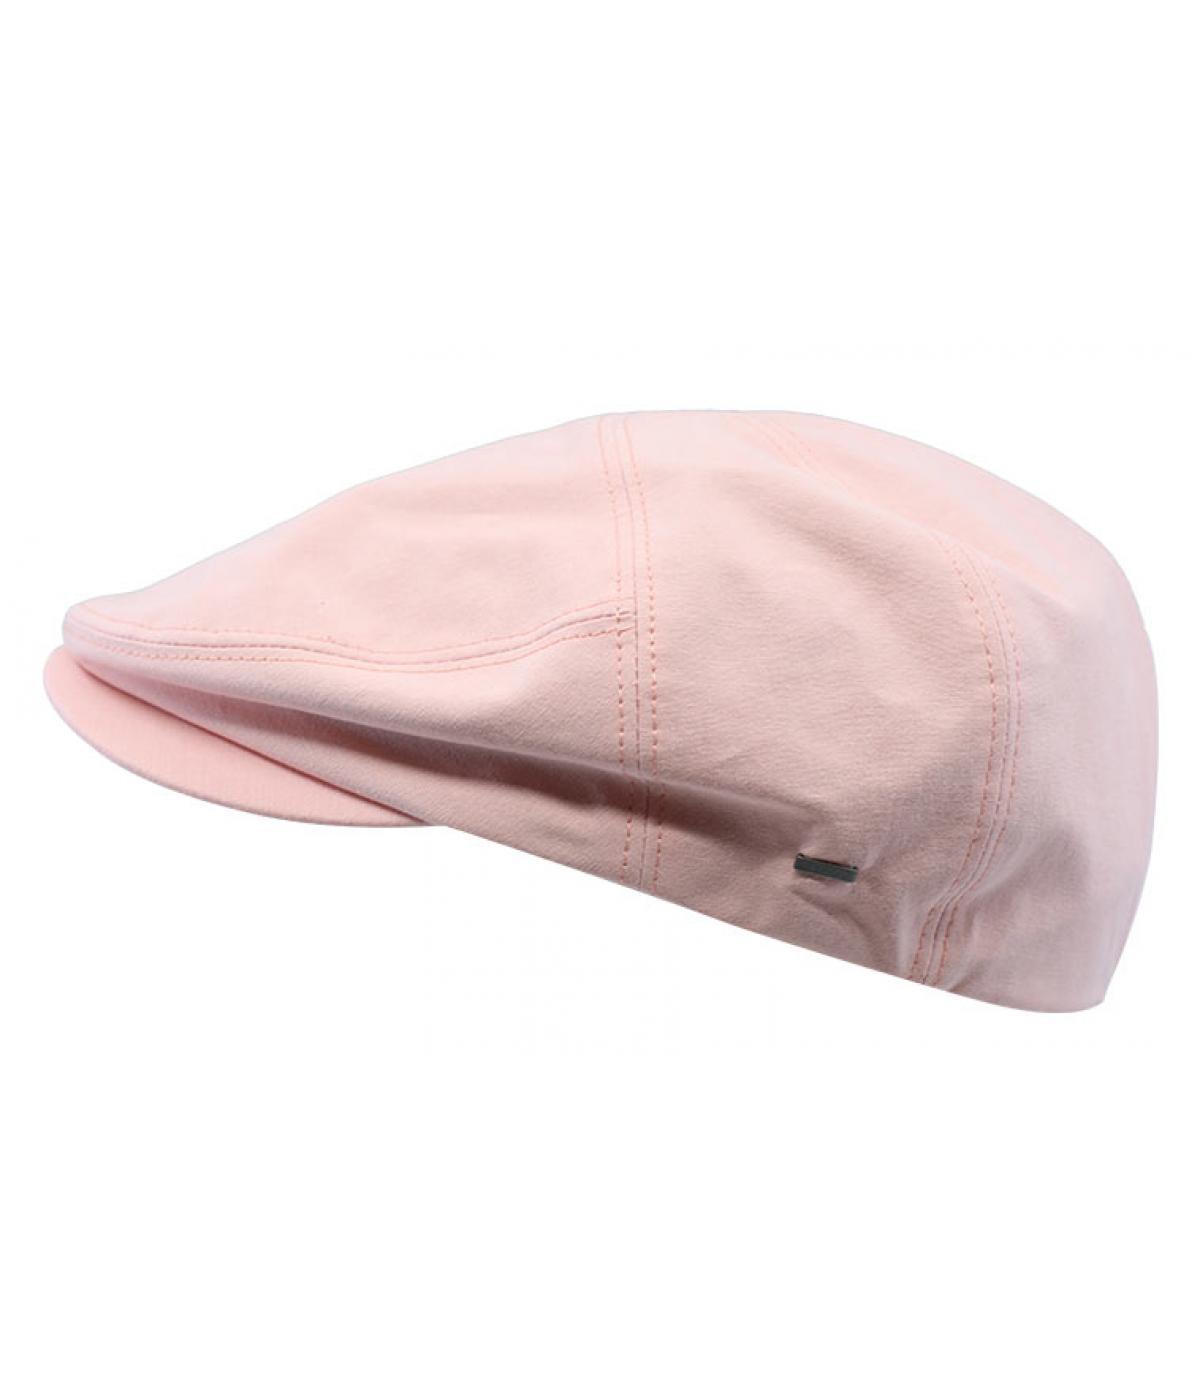 pink flat cap cotton